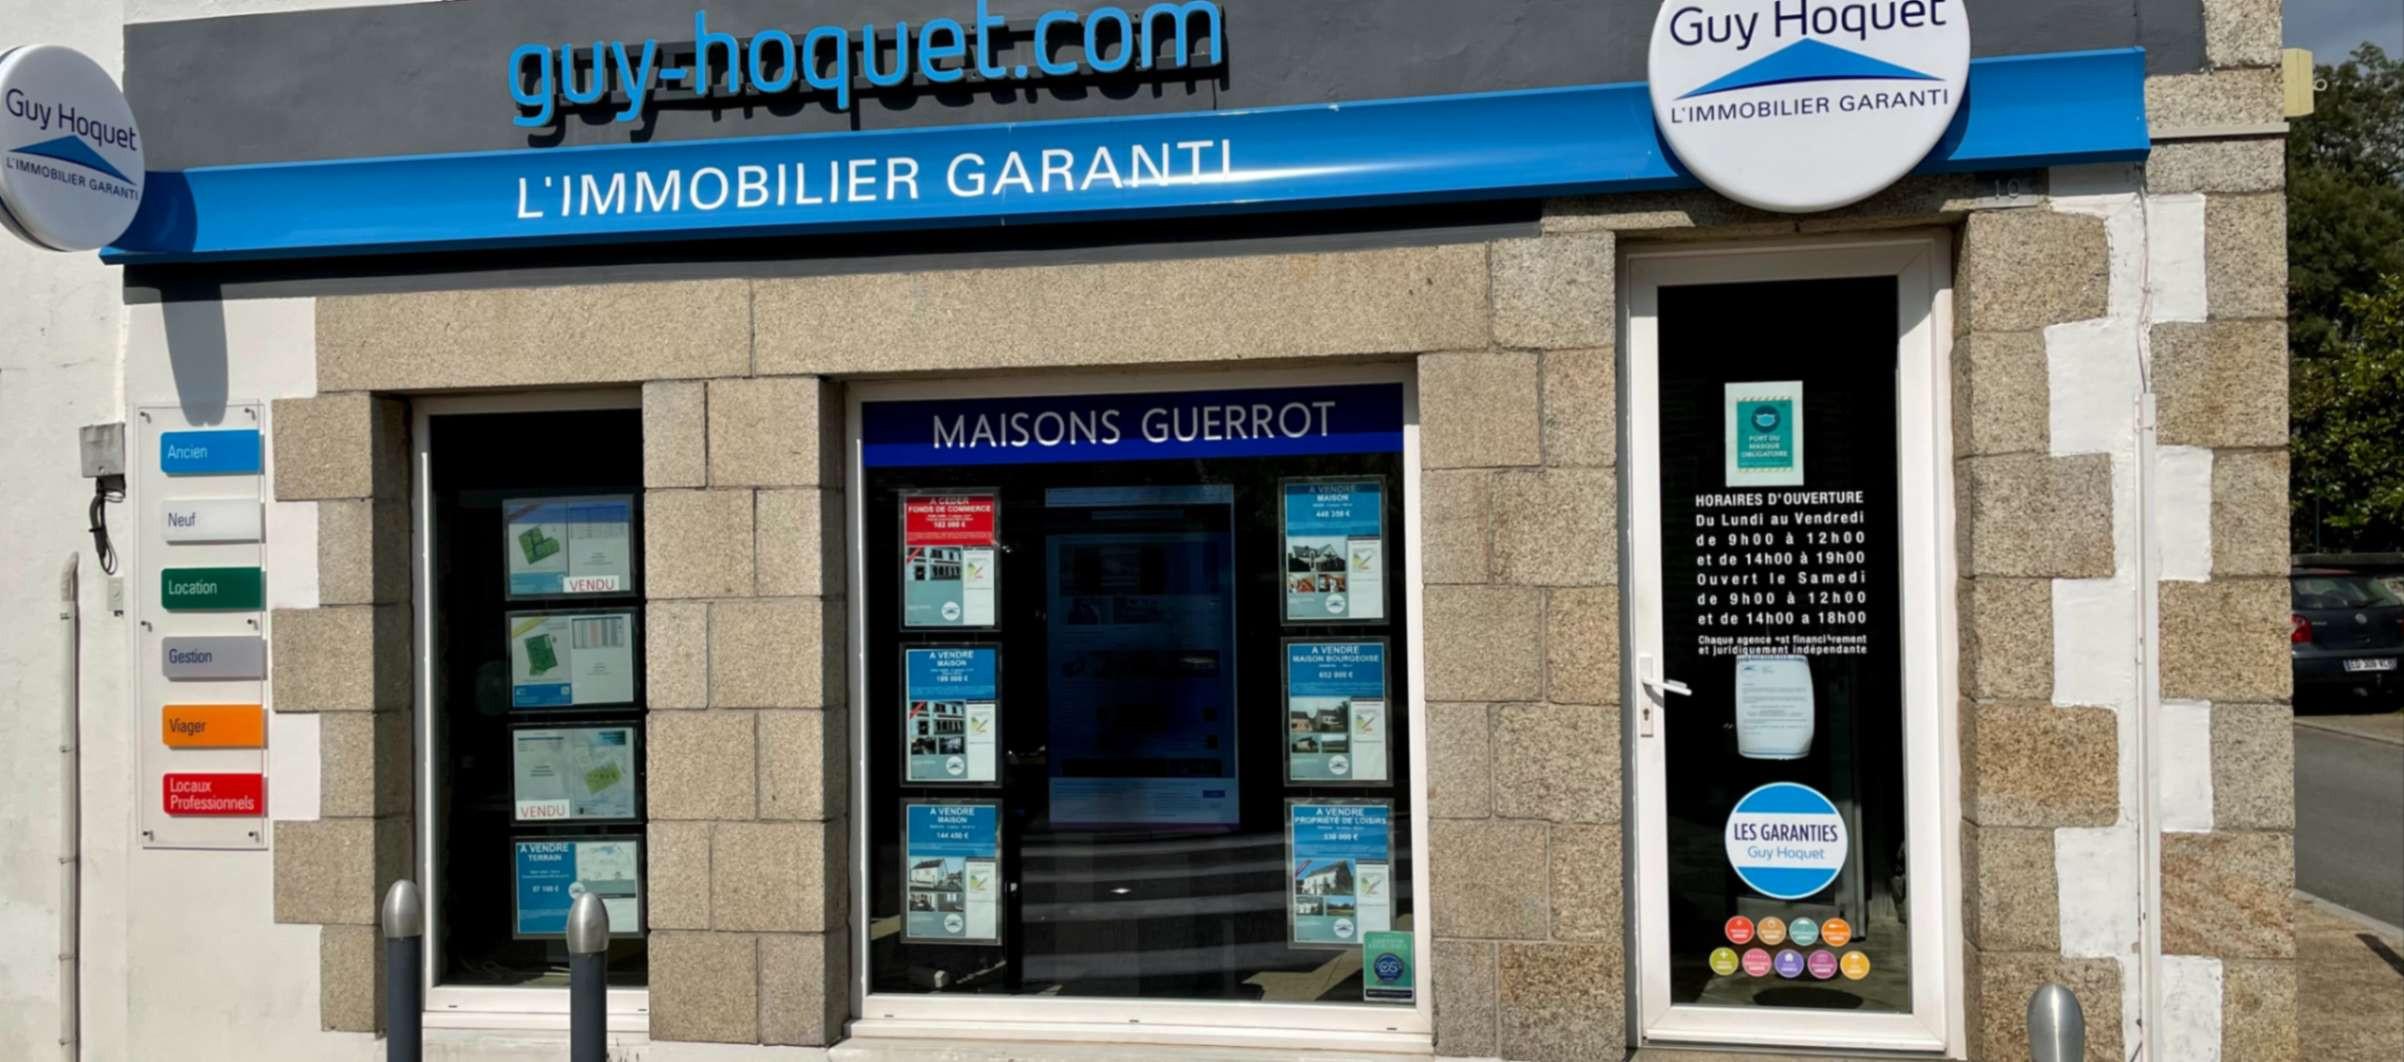 Agence Guy Hoquet NEVEZ